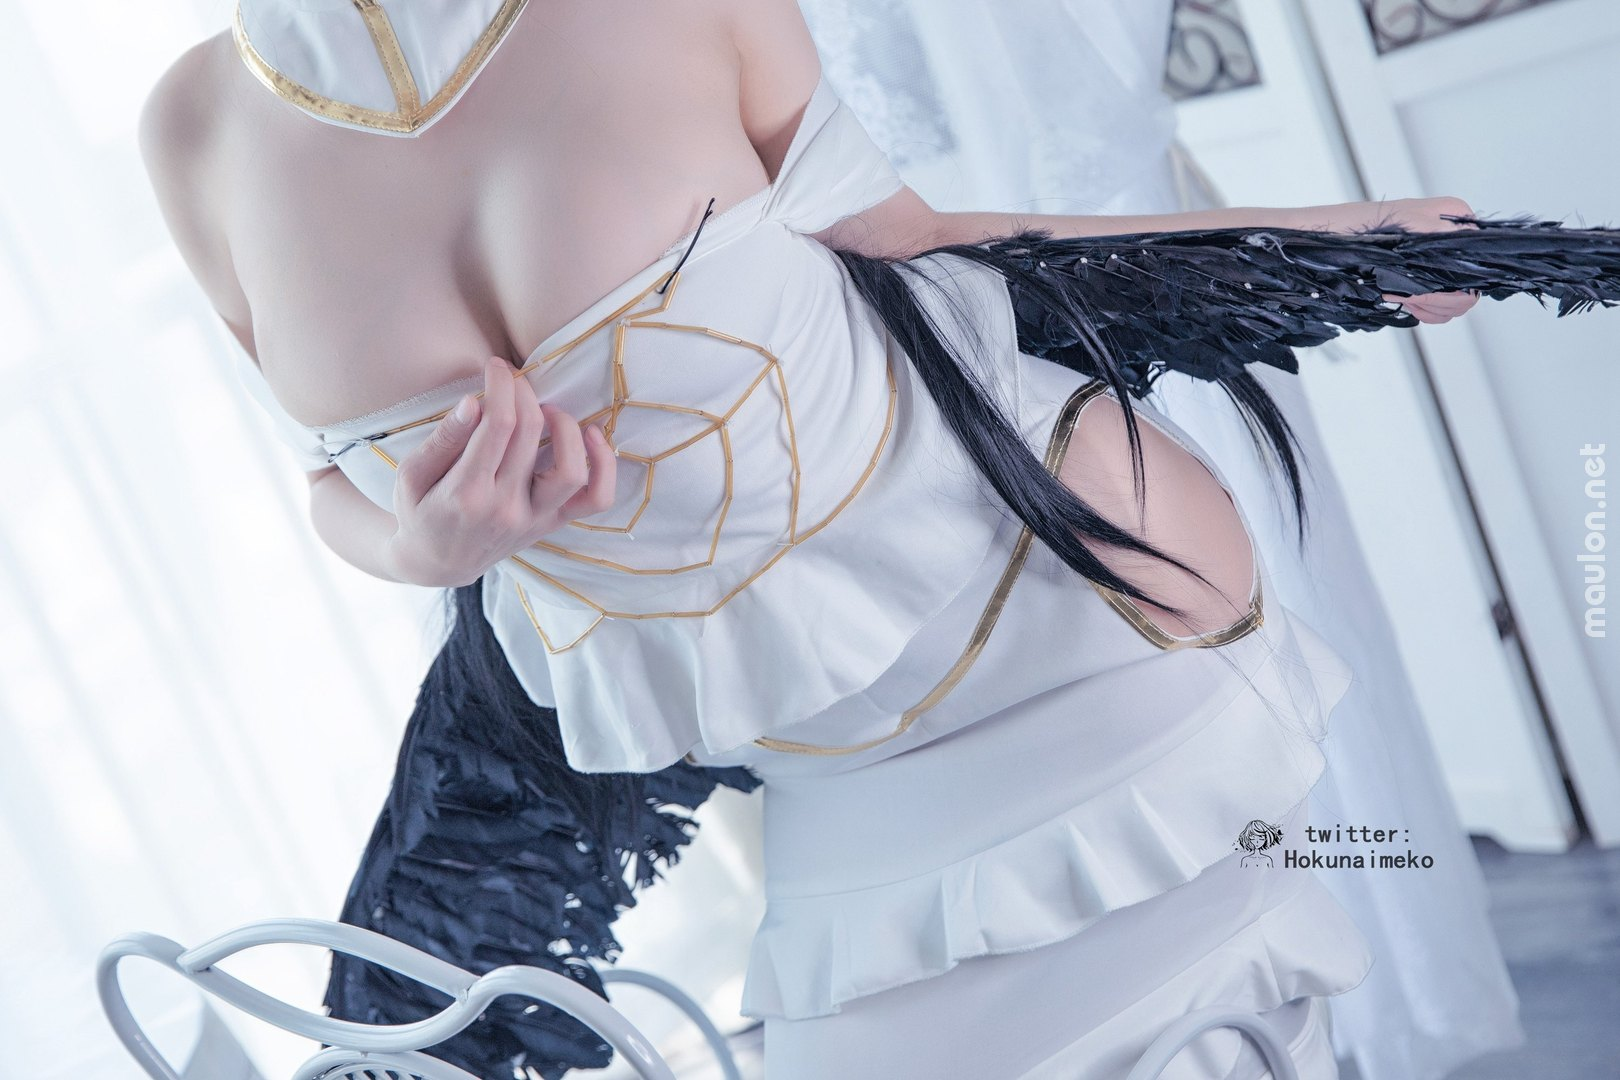 MauLon.Net - Hình ảnh sex cosplay Albedo - Overlord